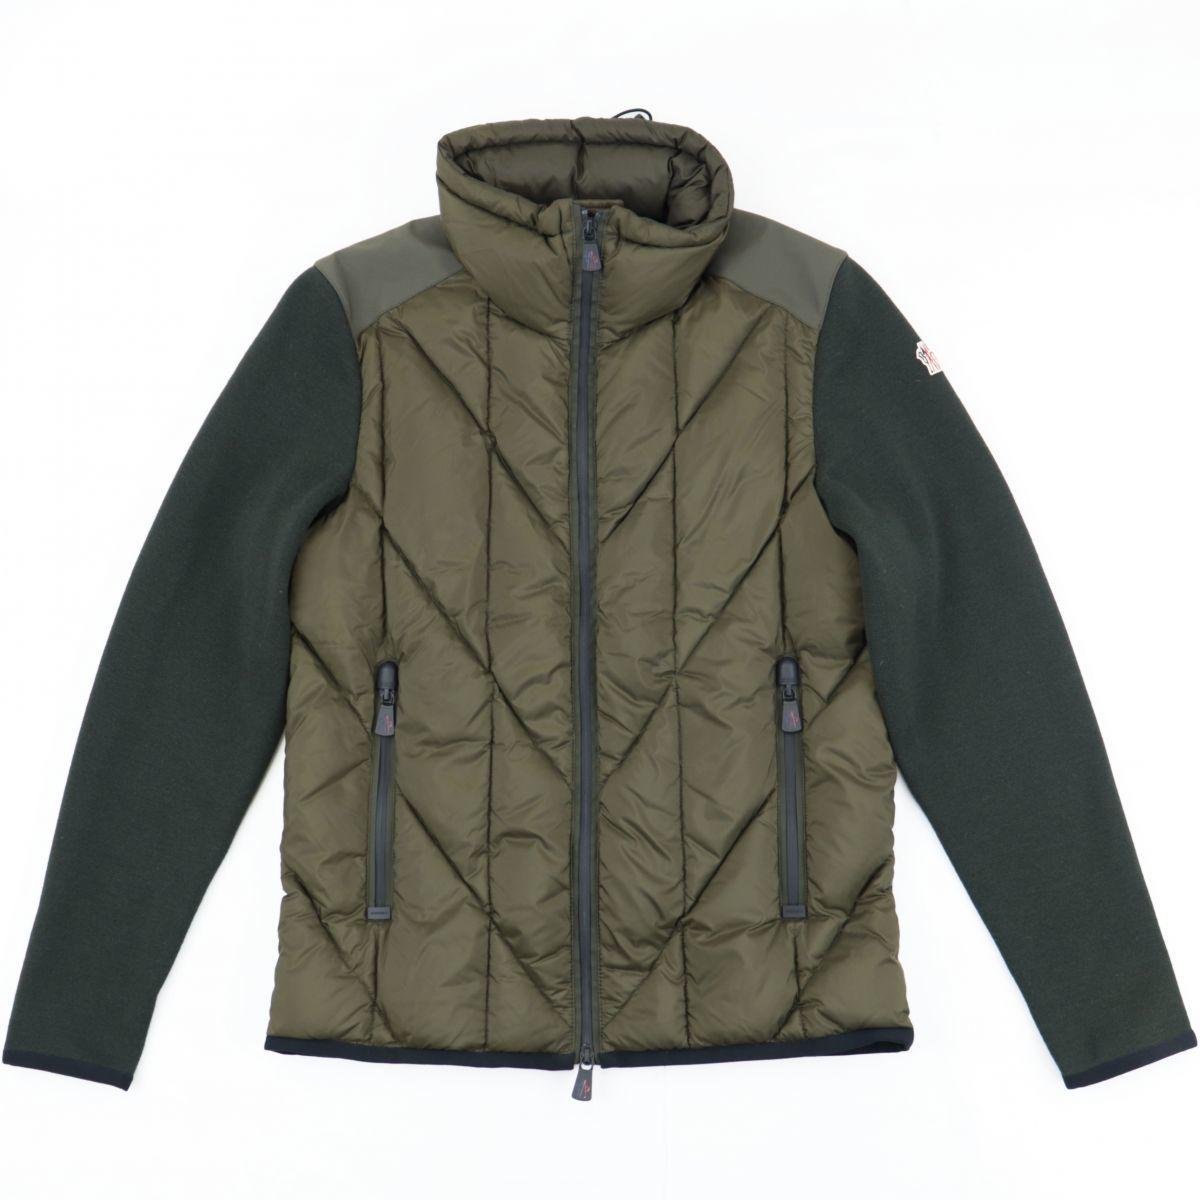 Moncler Grenoble Knit Switching Down Cardigan Men's Khaki M Jacket Zip Up GRENOBLE